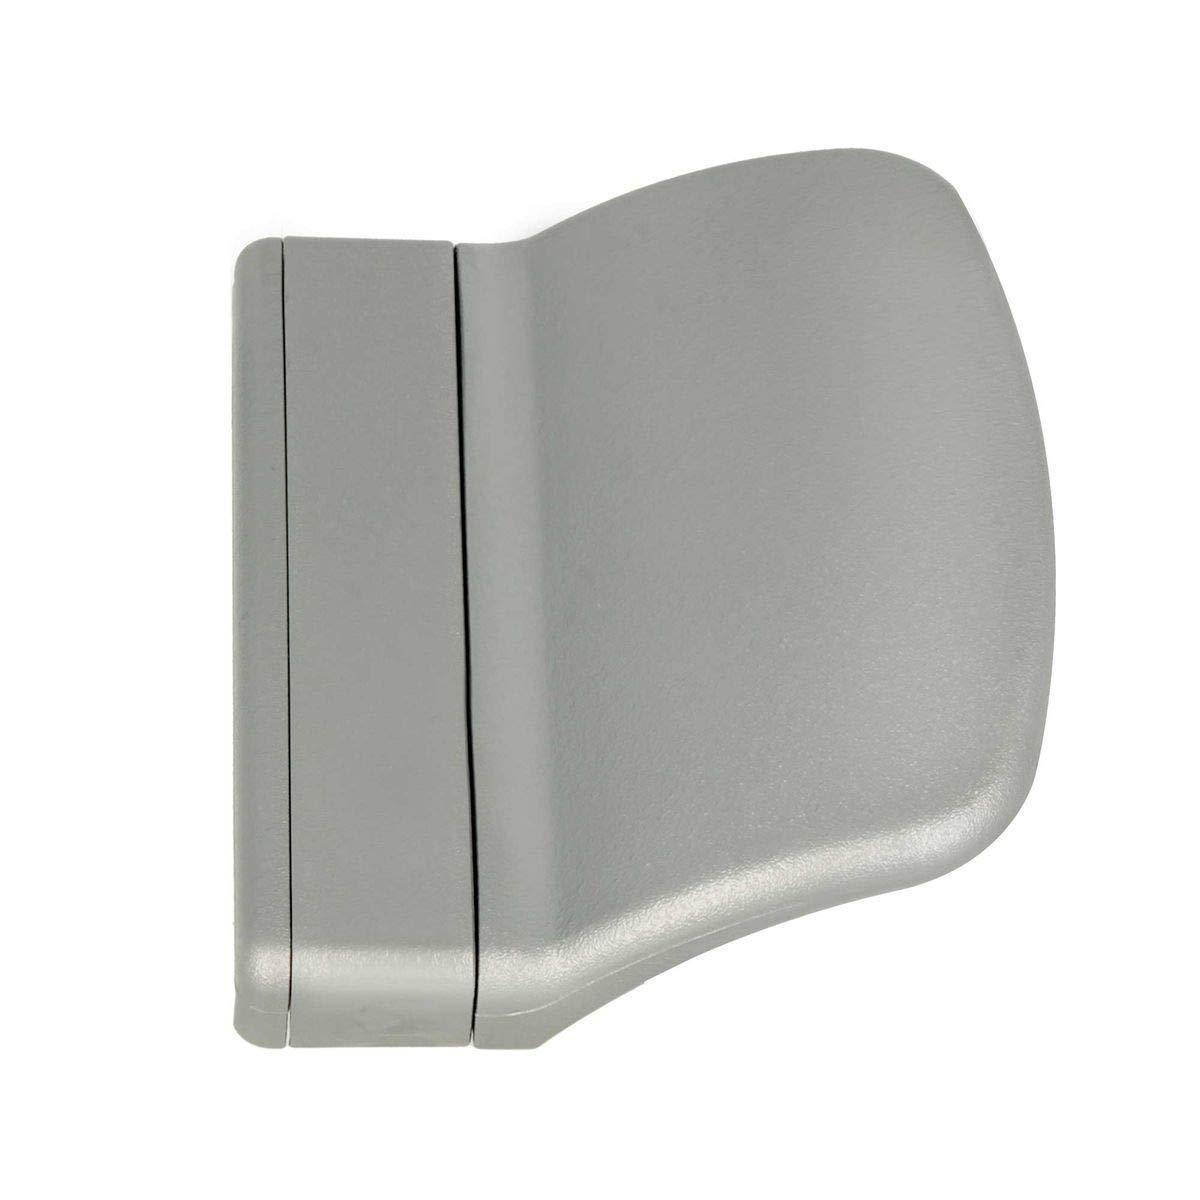 Farbe:Grau RAL 7016 Kunststoff Balkont/ür Ziehgriff